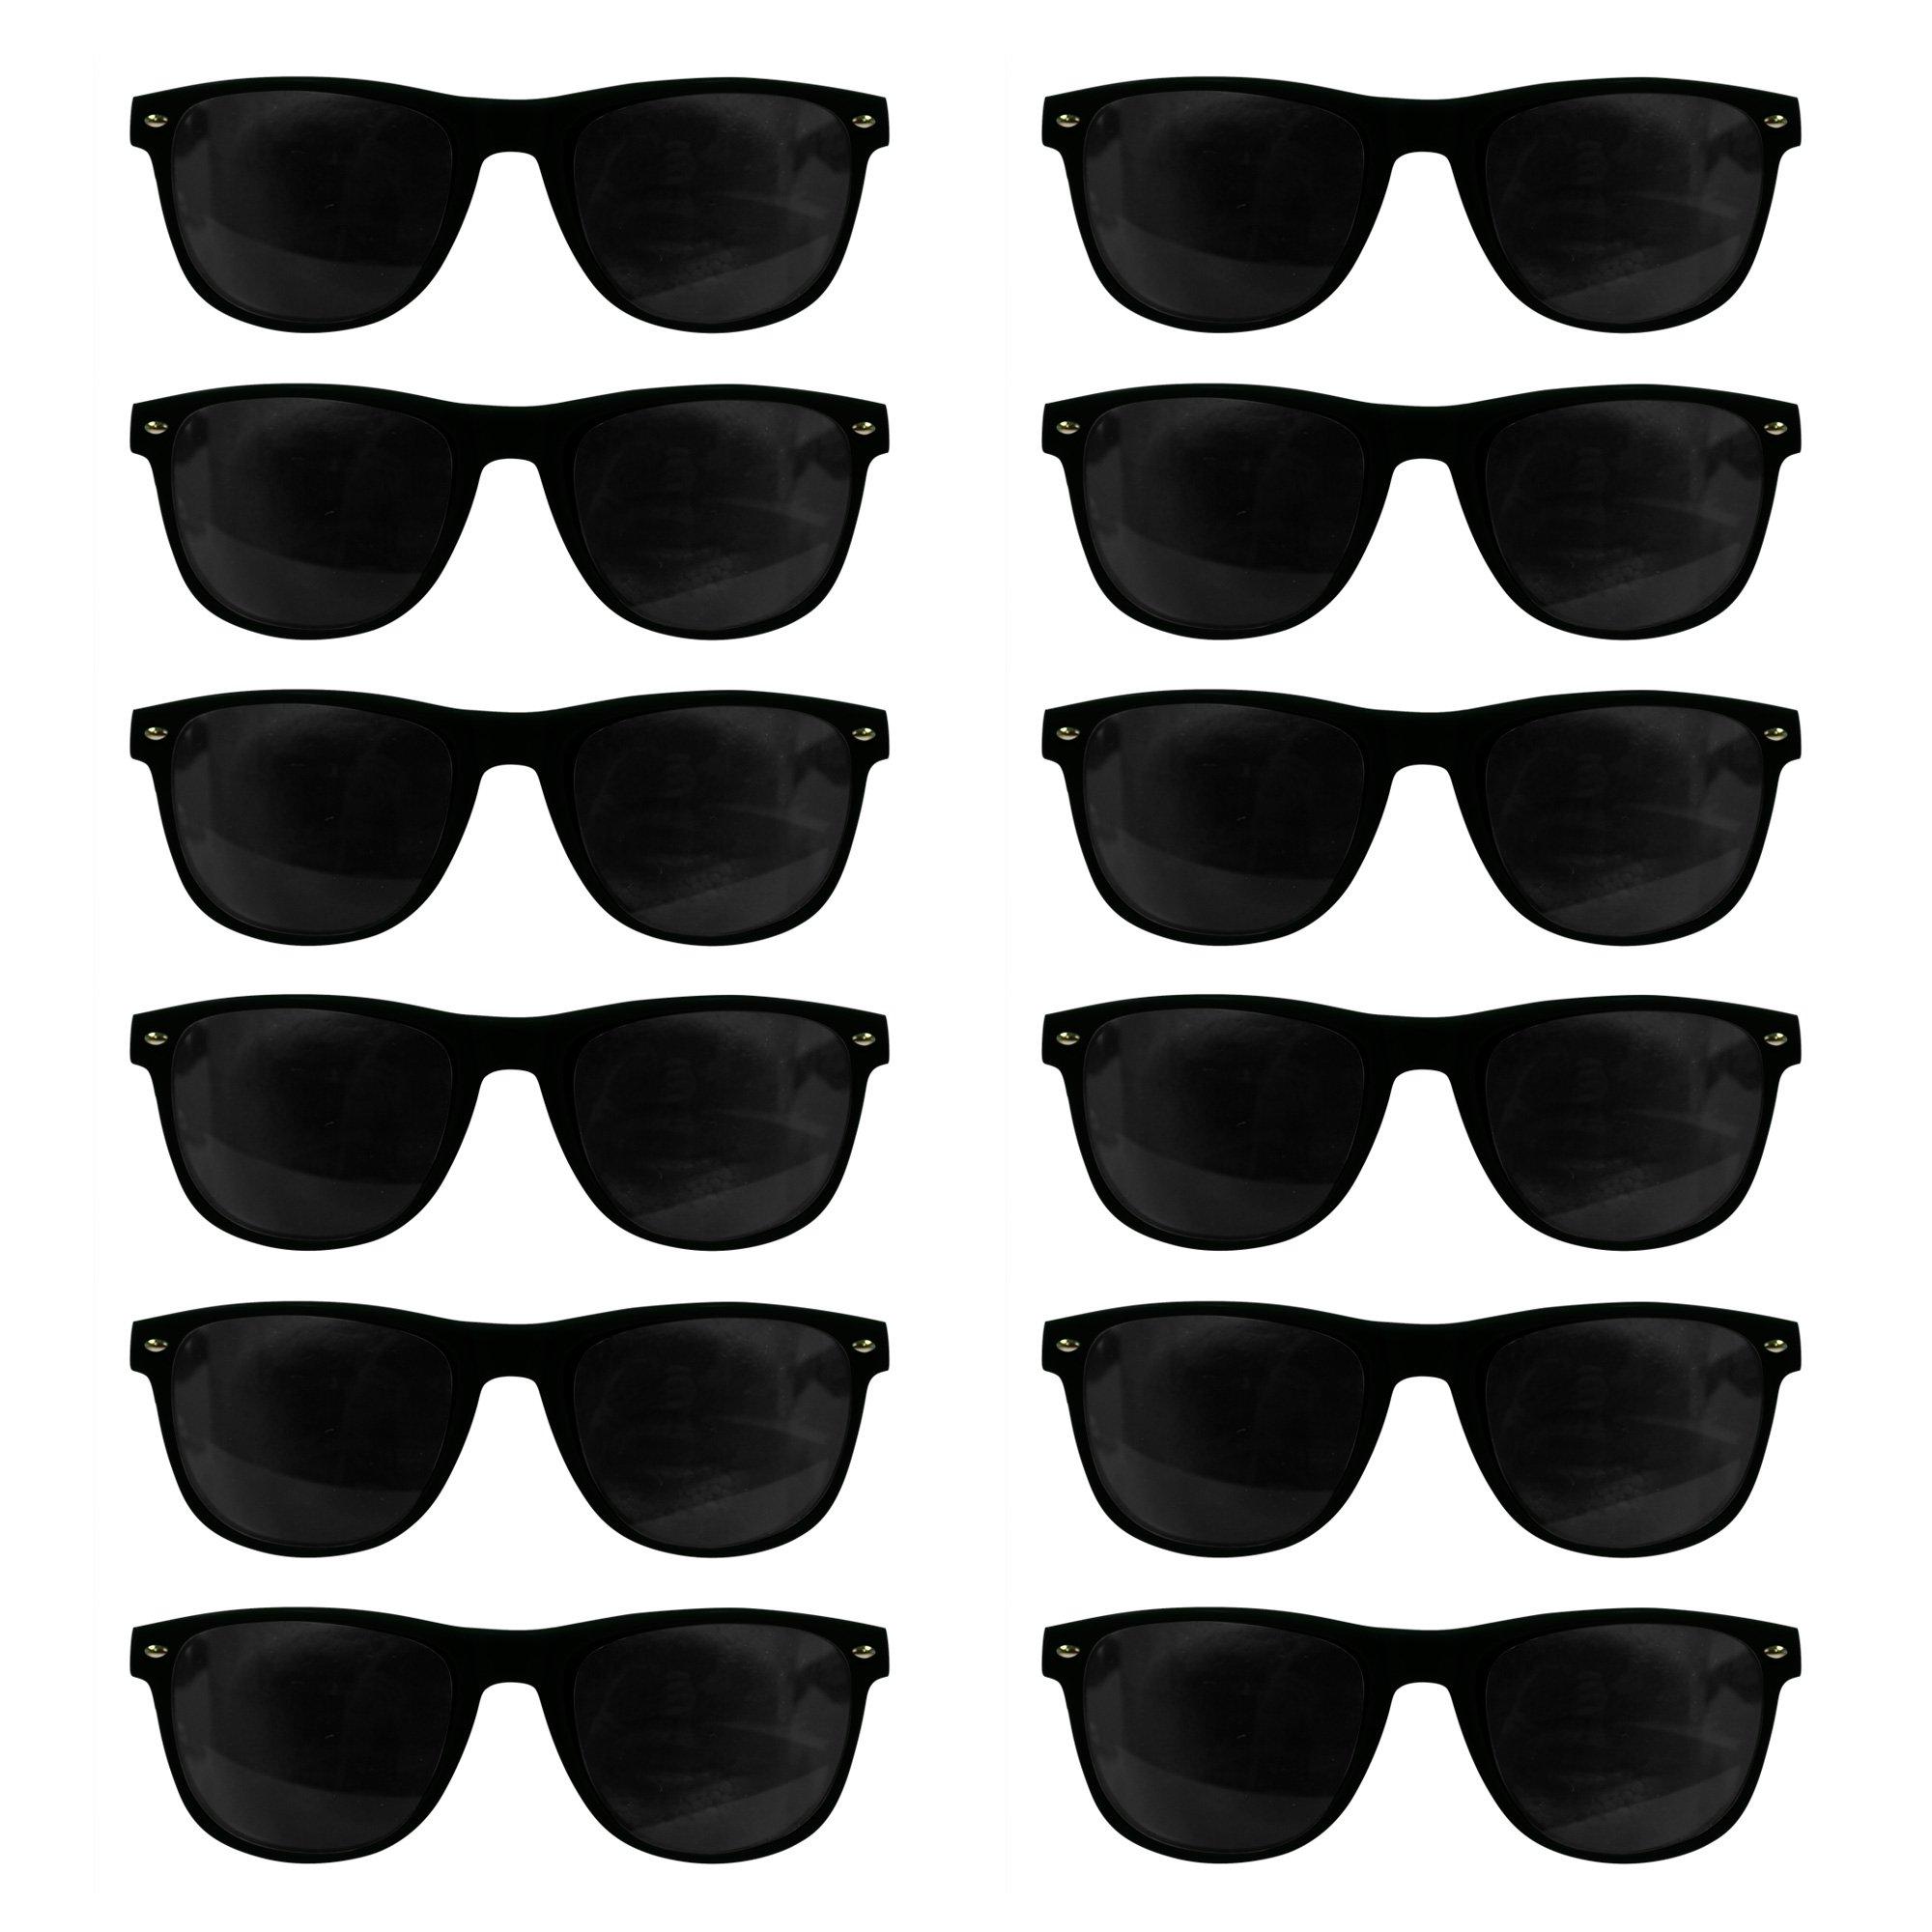 12 Pack Black Retro Sunglasses Bulk for Kids Adults Party Favors